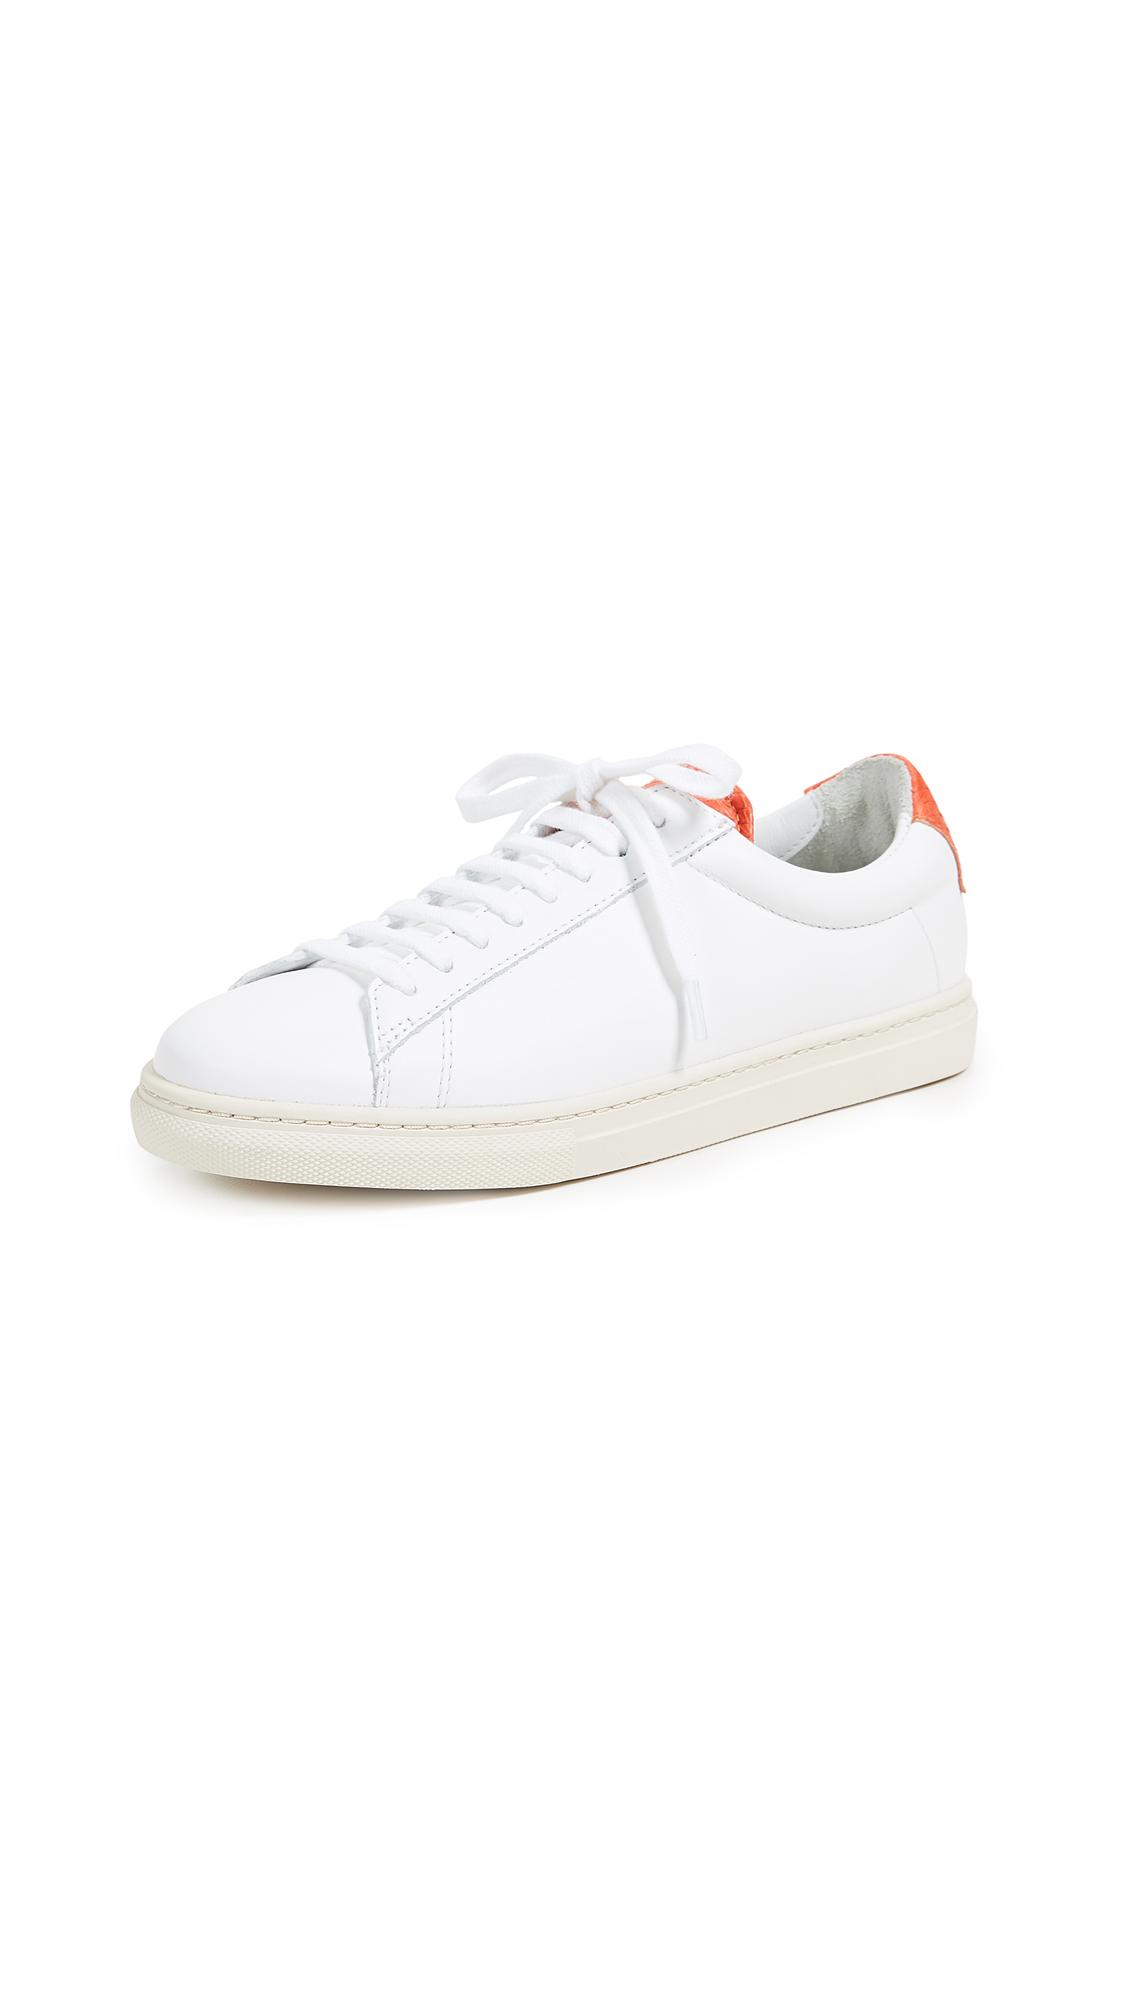 Zespa Lace Up Sneakers - White/Orange